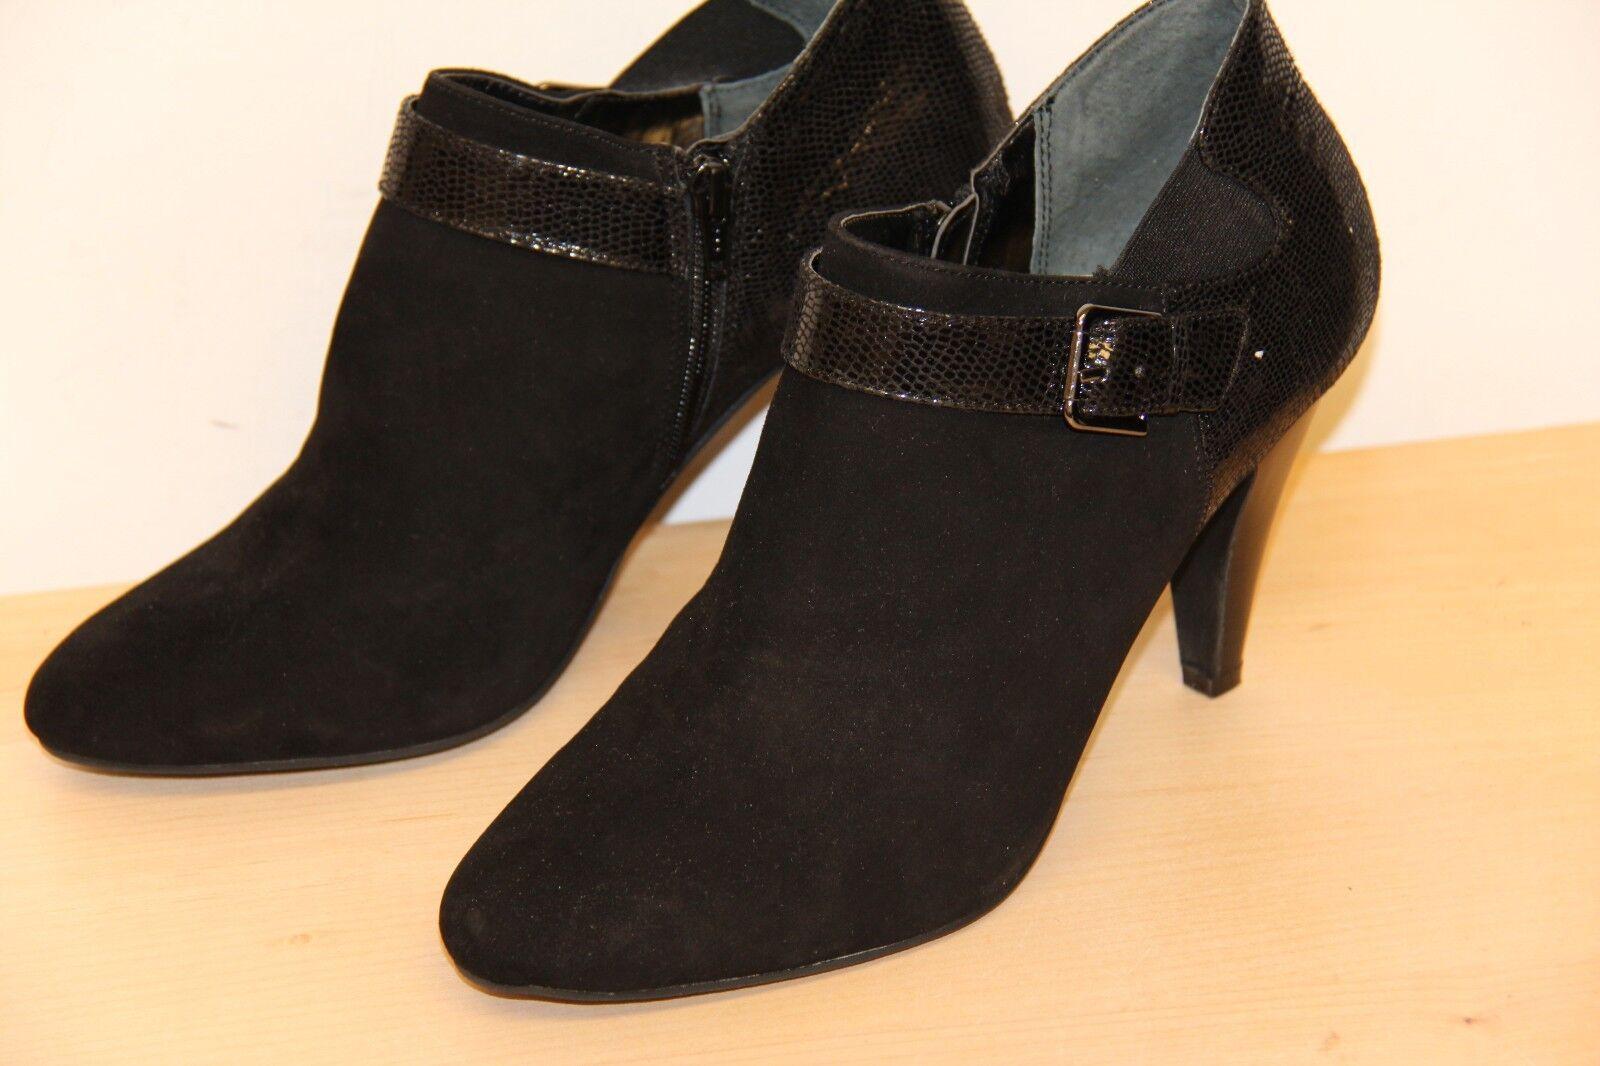 NIB ALFANI SHIRLEE Leather Ankle Shooties Heeel Boots Size 10 M Black